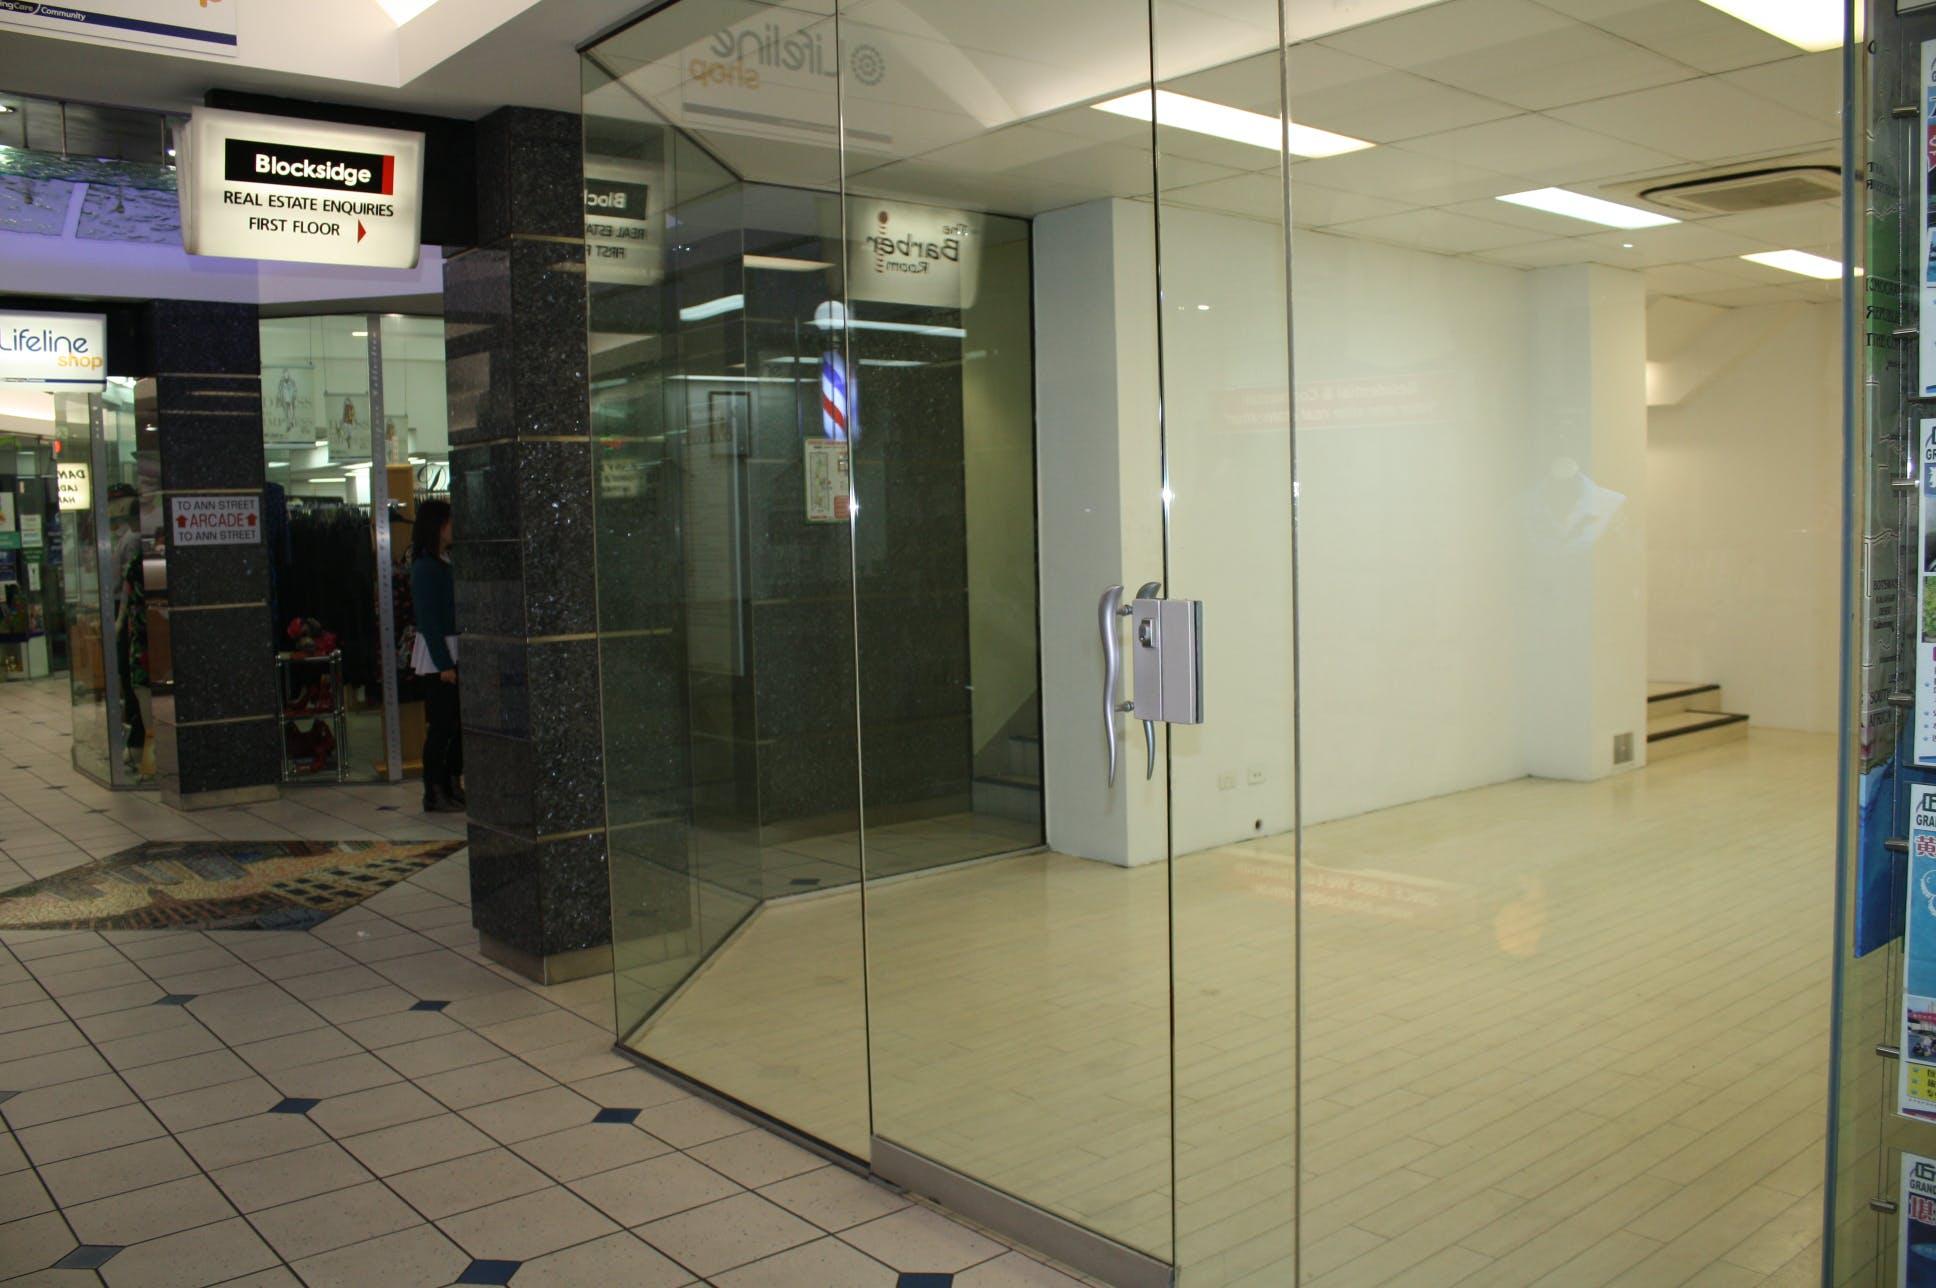 Shopfront at Blocksidge & Ferguson Arcade, image 1